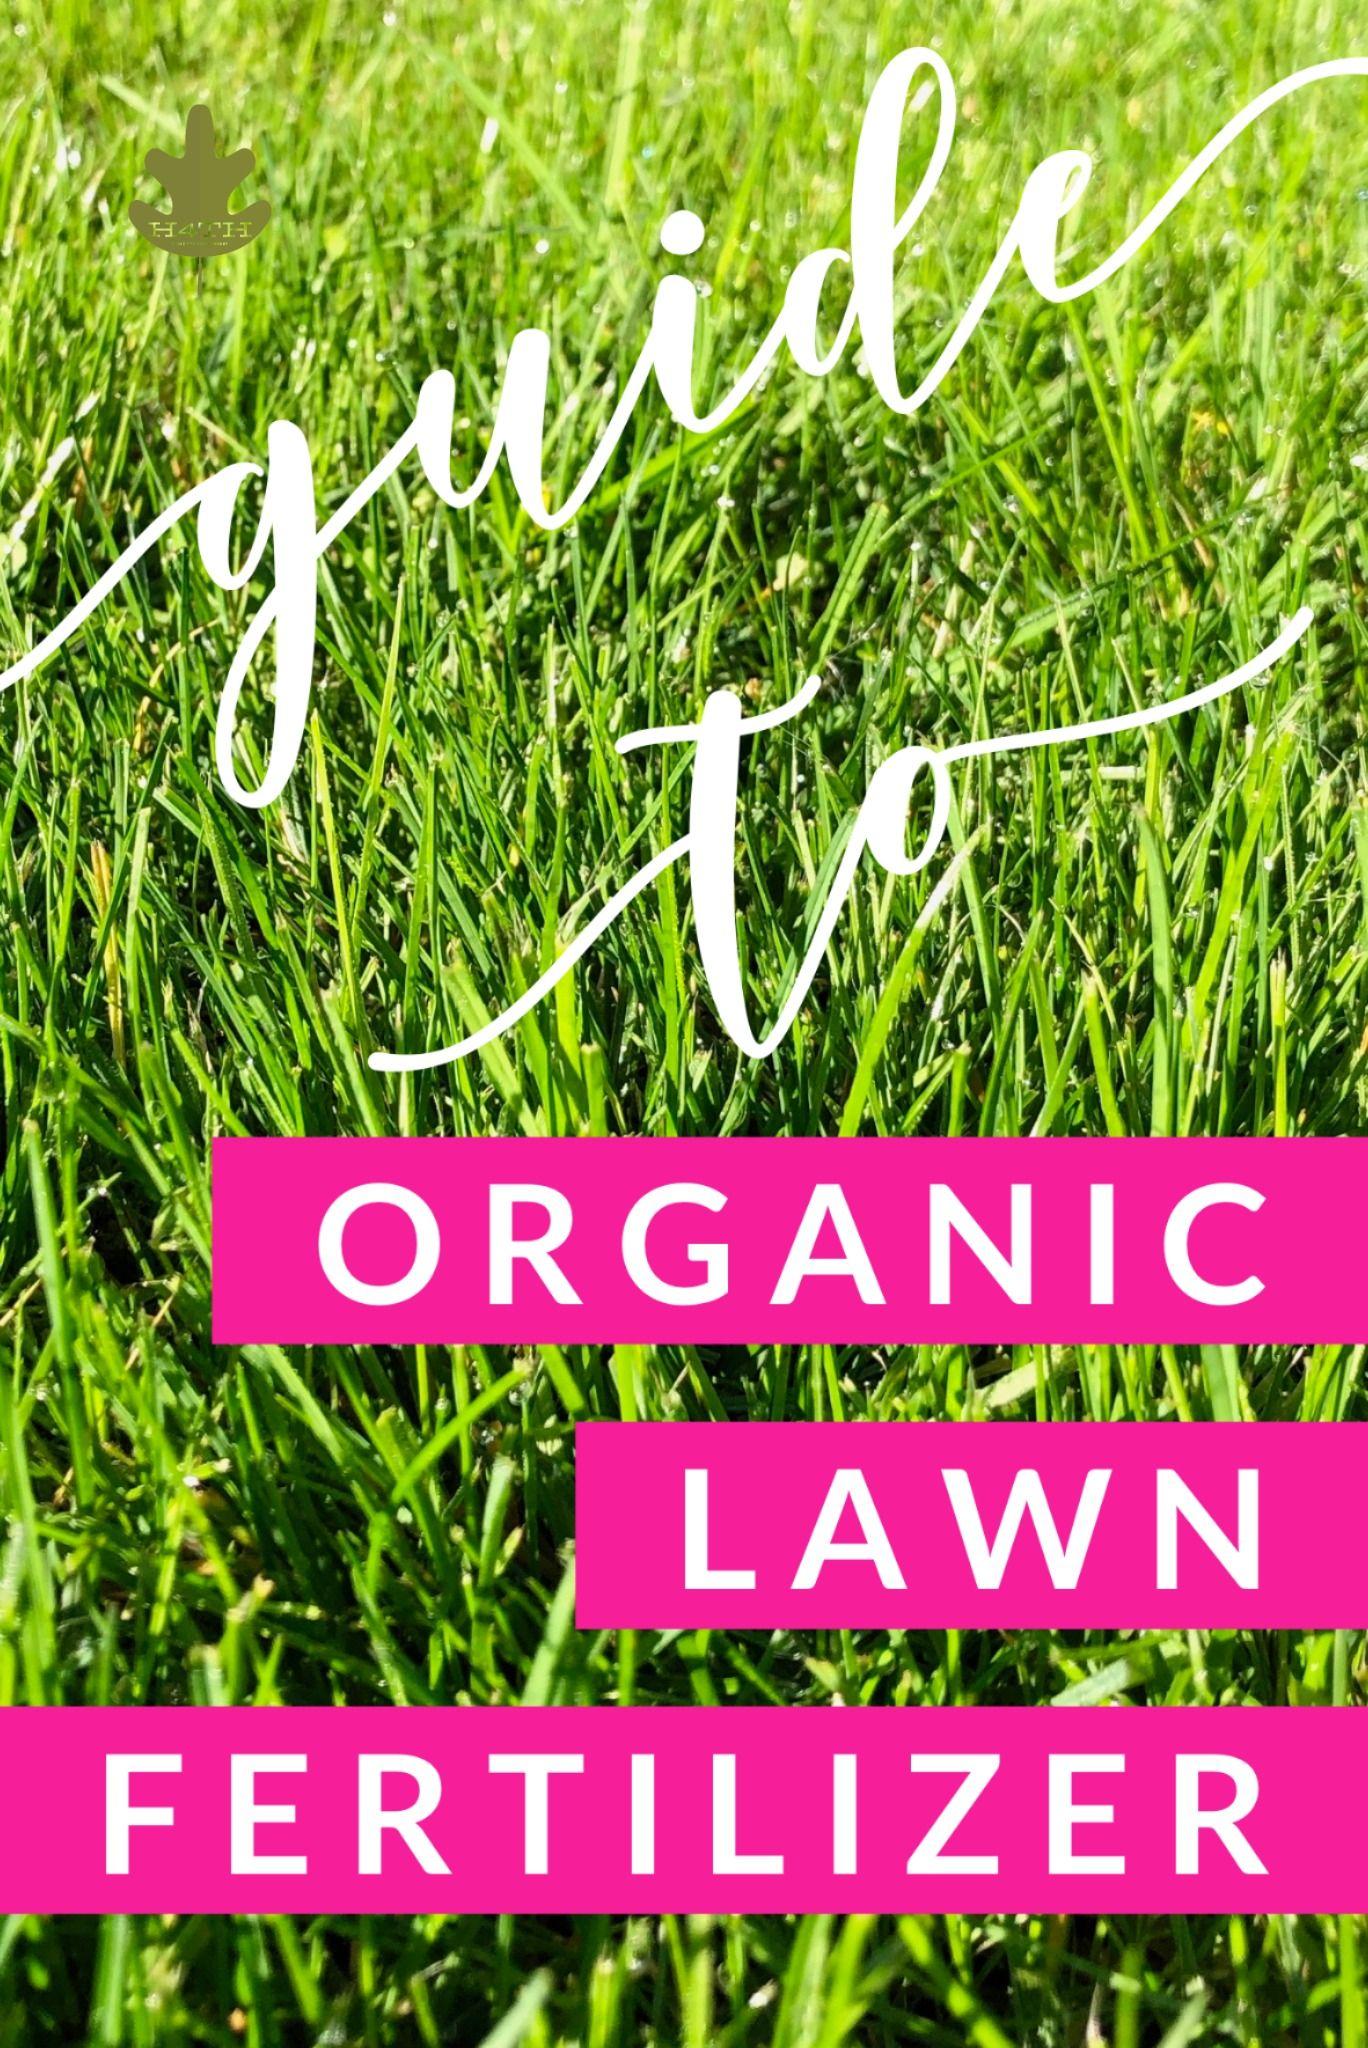 Organic Lawn Fertilizer A Homeowner S Guide In 2020 Organic Lawn Organic Lawn Fertilizer Lawn Fertilizer